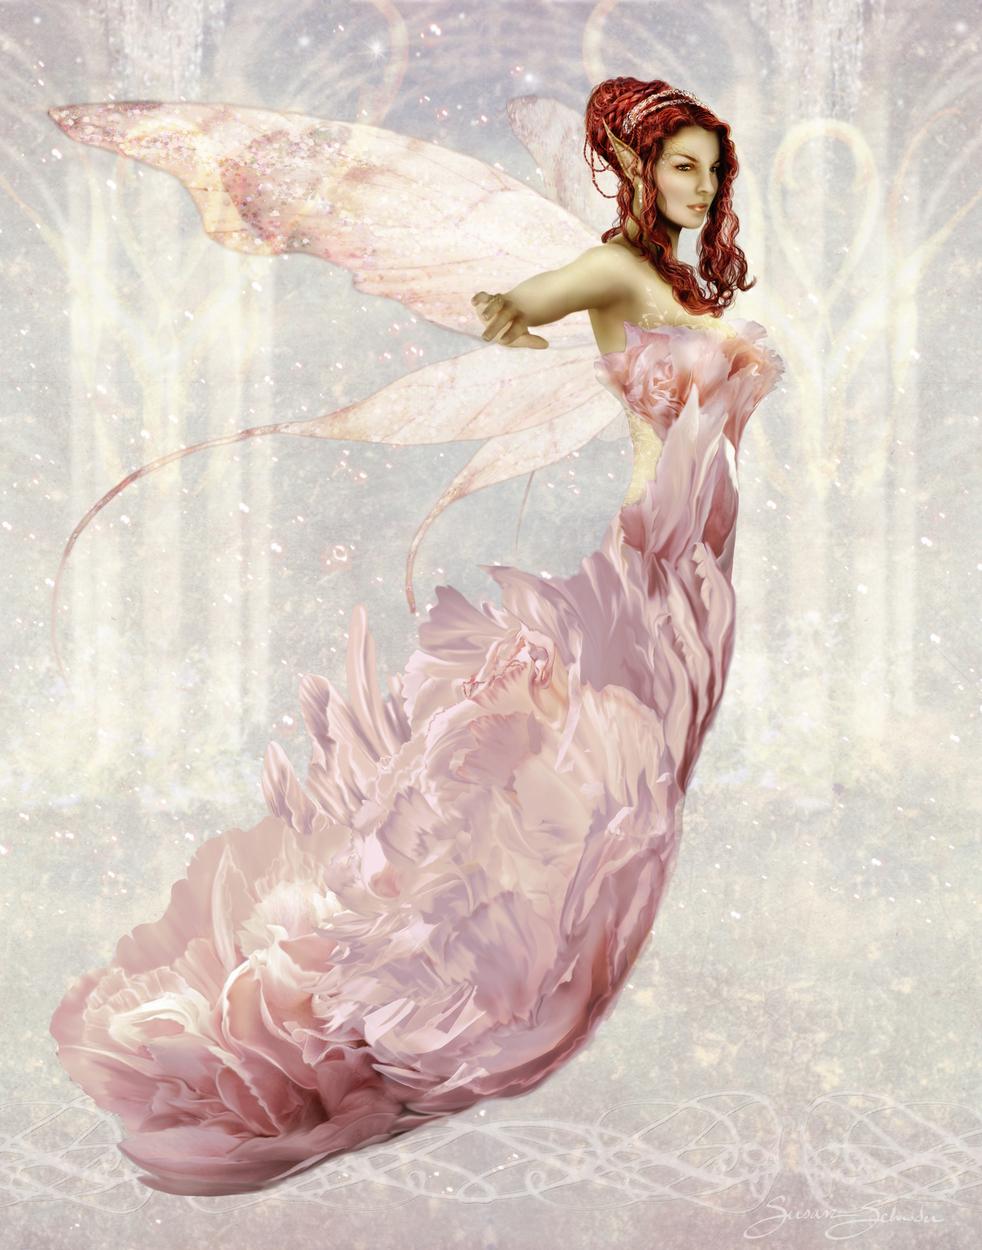 Faerie Queen Peony Artwork by Susan Schroder